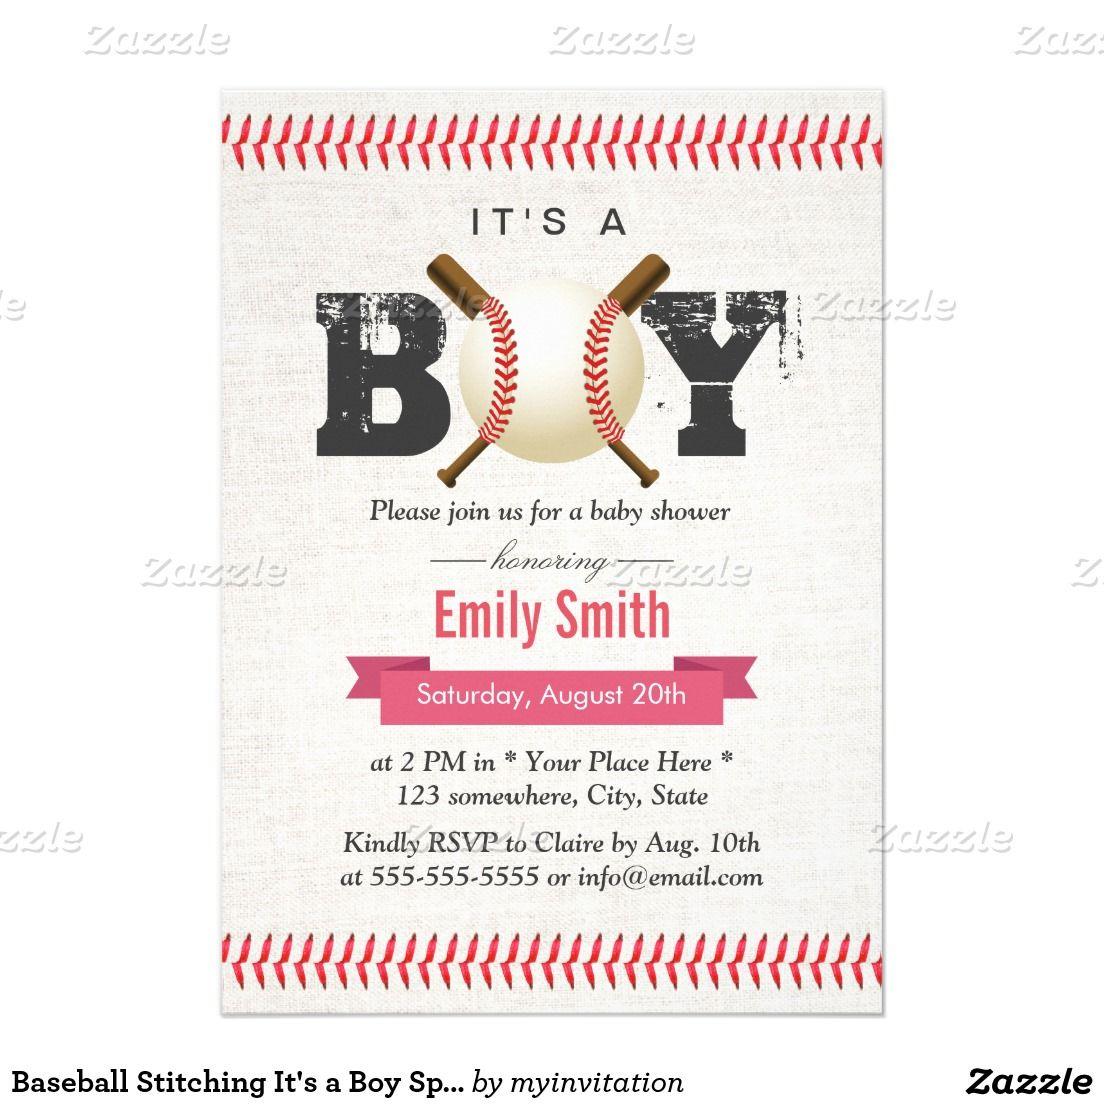 Baseball Stitching It\'s a Boy Sports Baby Shower Invitation   Lil ...